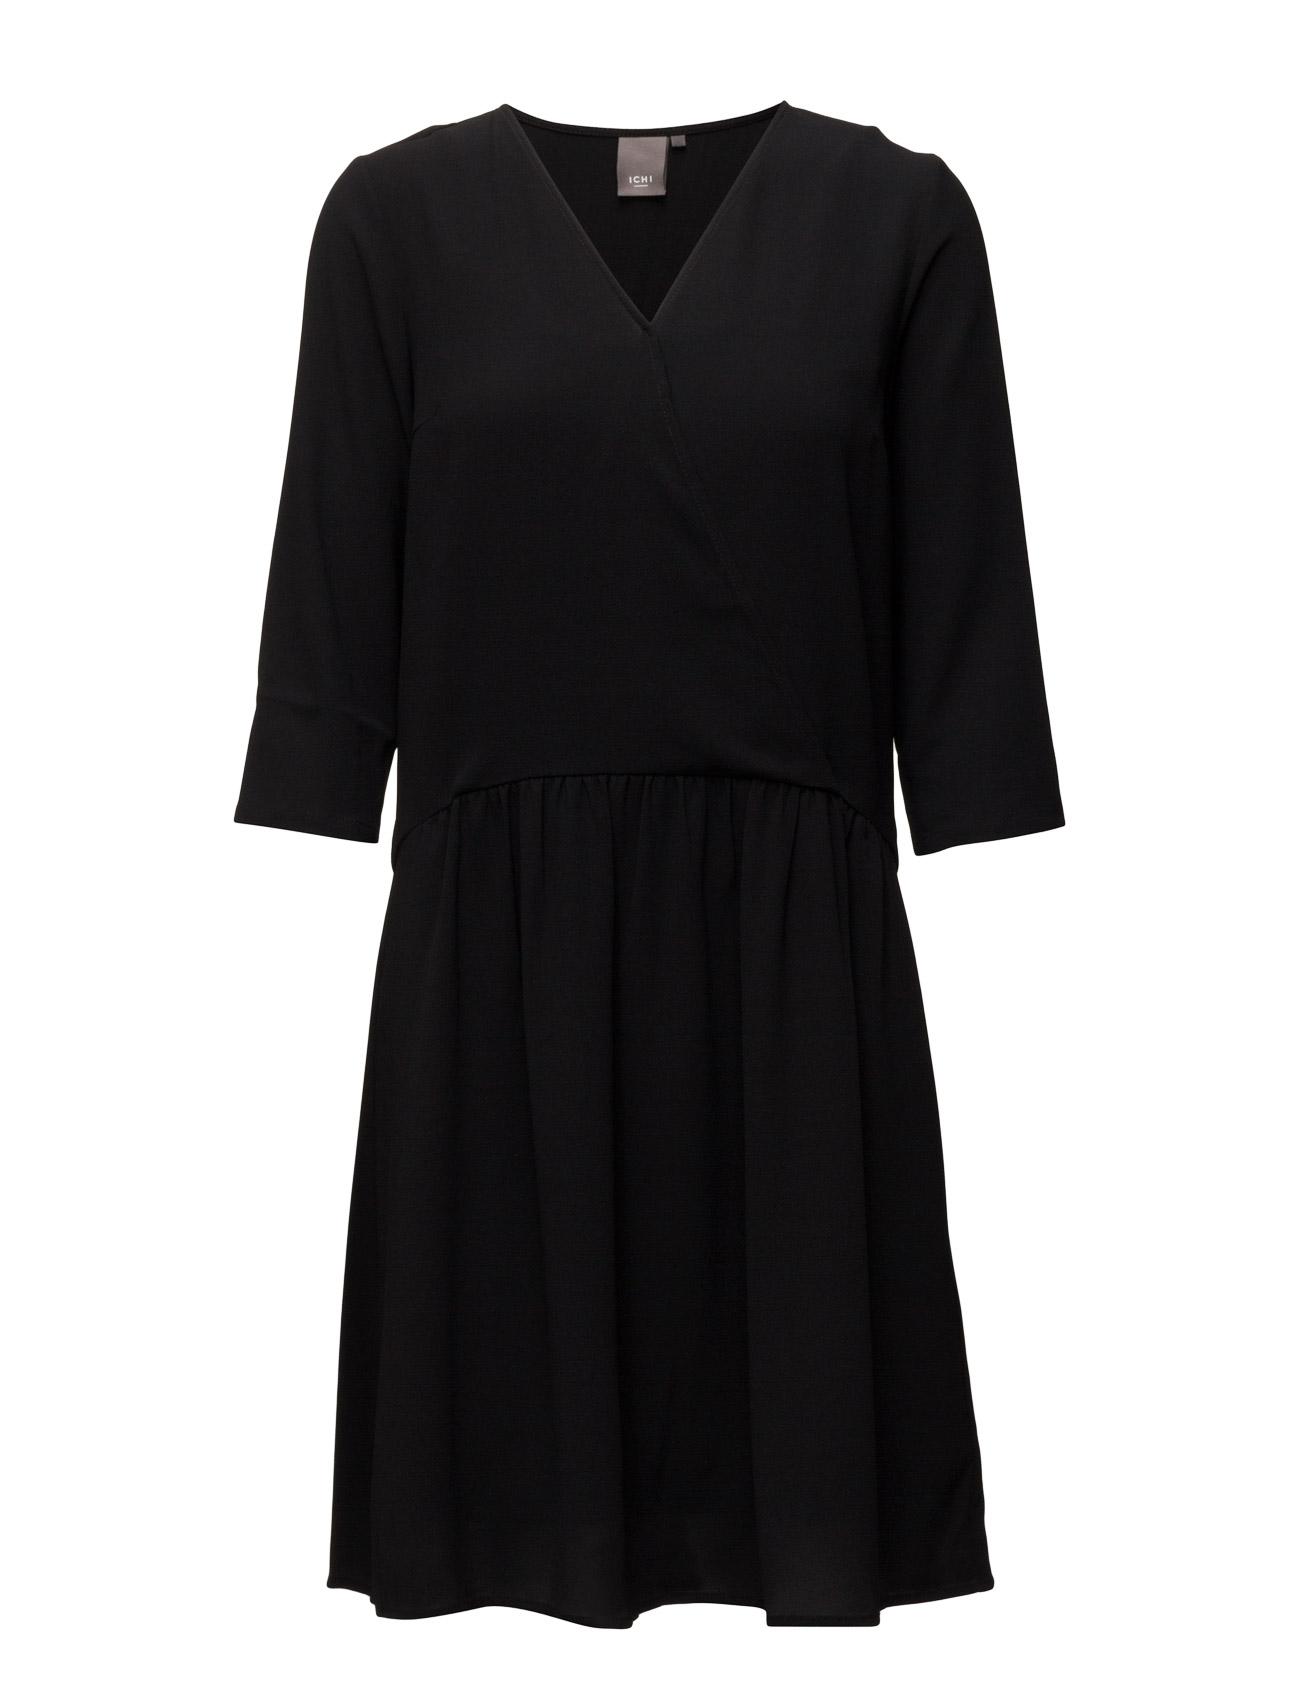 Bright Dr2 ICHI Korte kjoler til Kvinder i Rose Røg